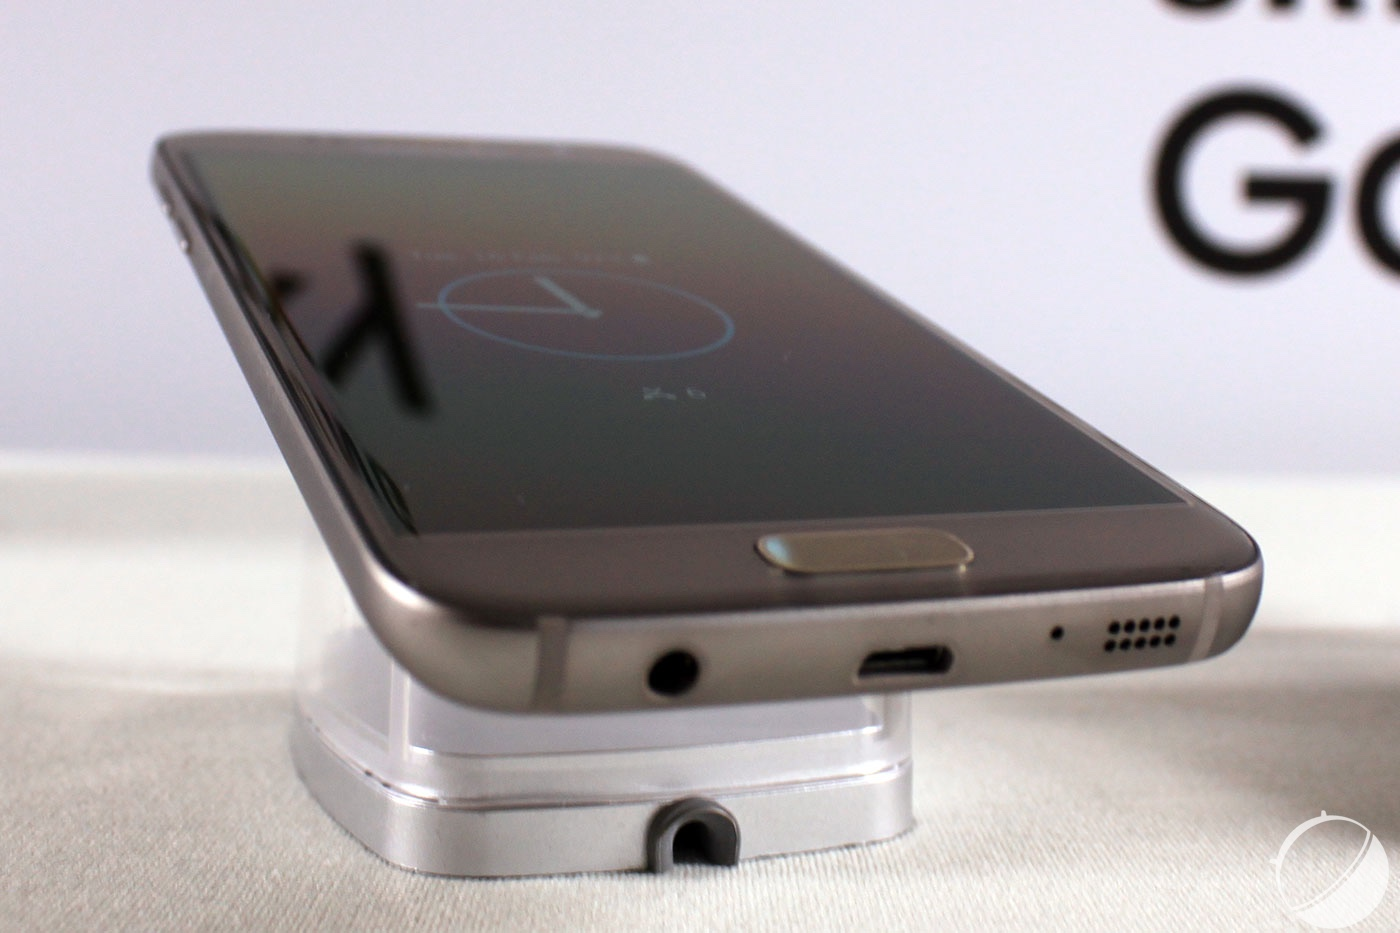 Prise En Main Du Samsung Galaxy S7 Edge Tout D Un Grand Frandroid